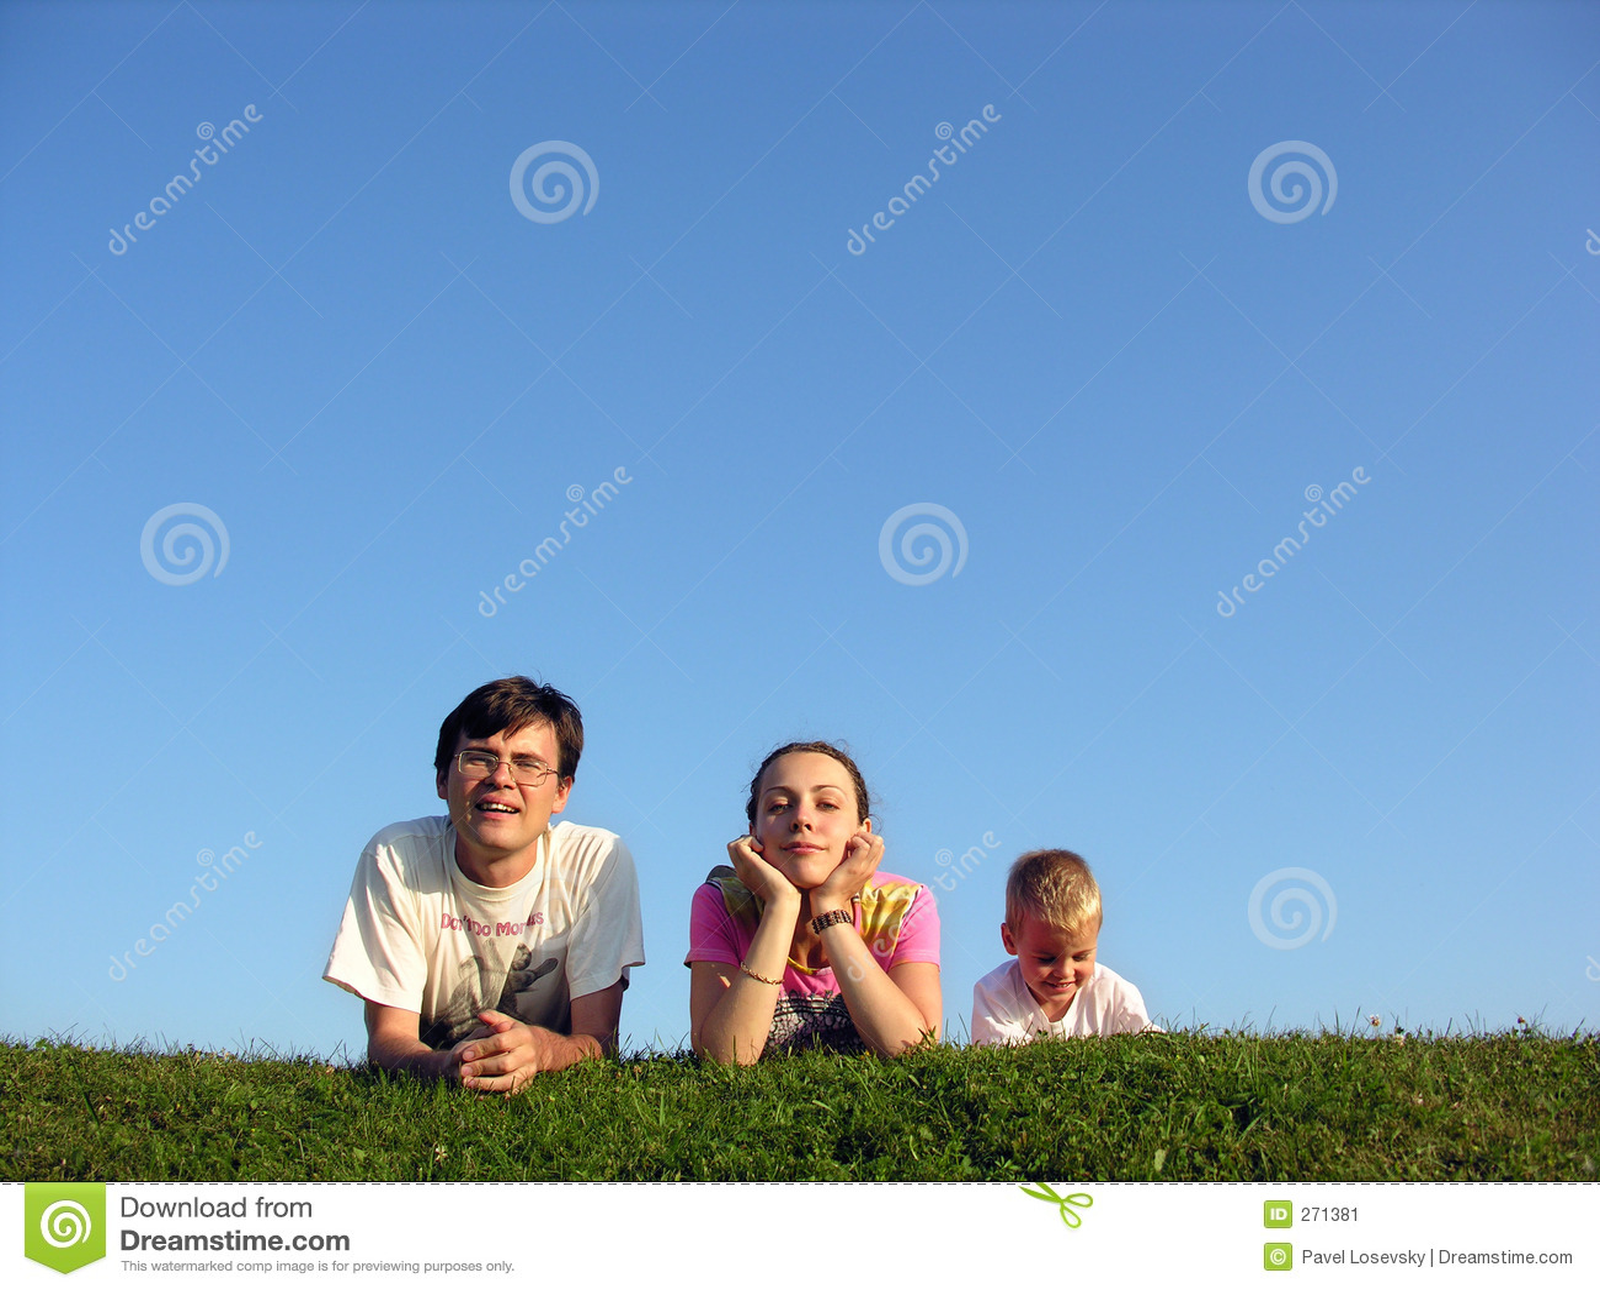 Family on herb under sky 2